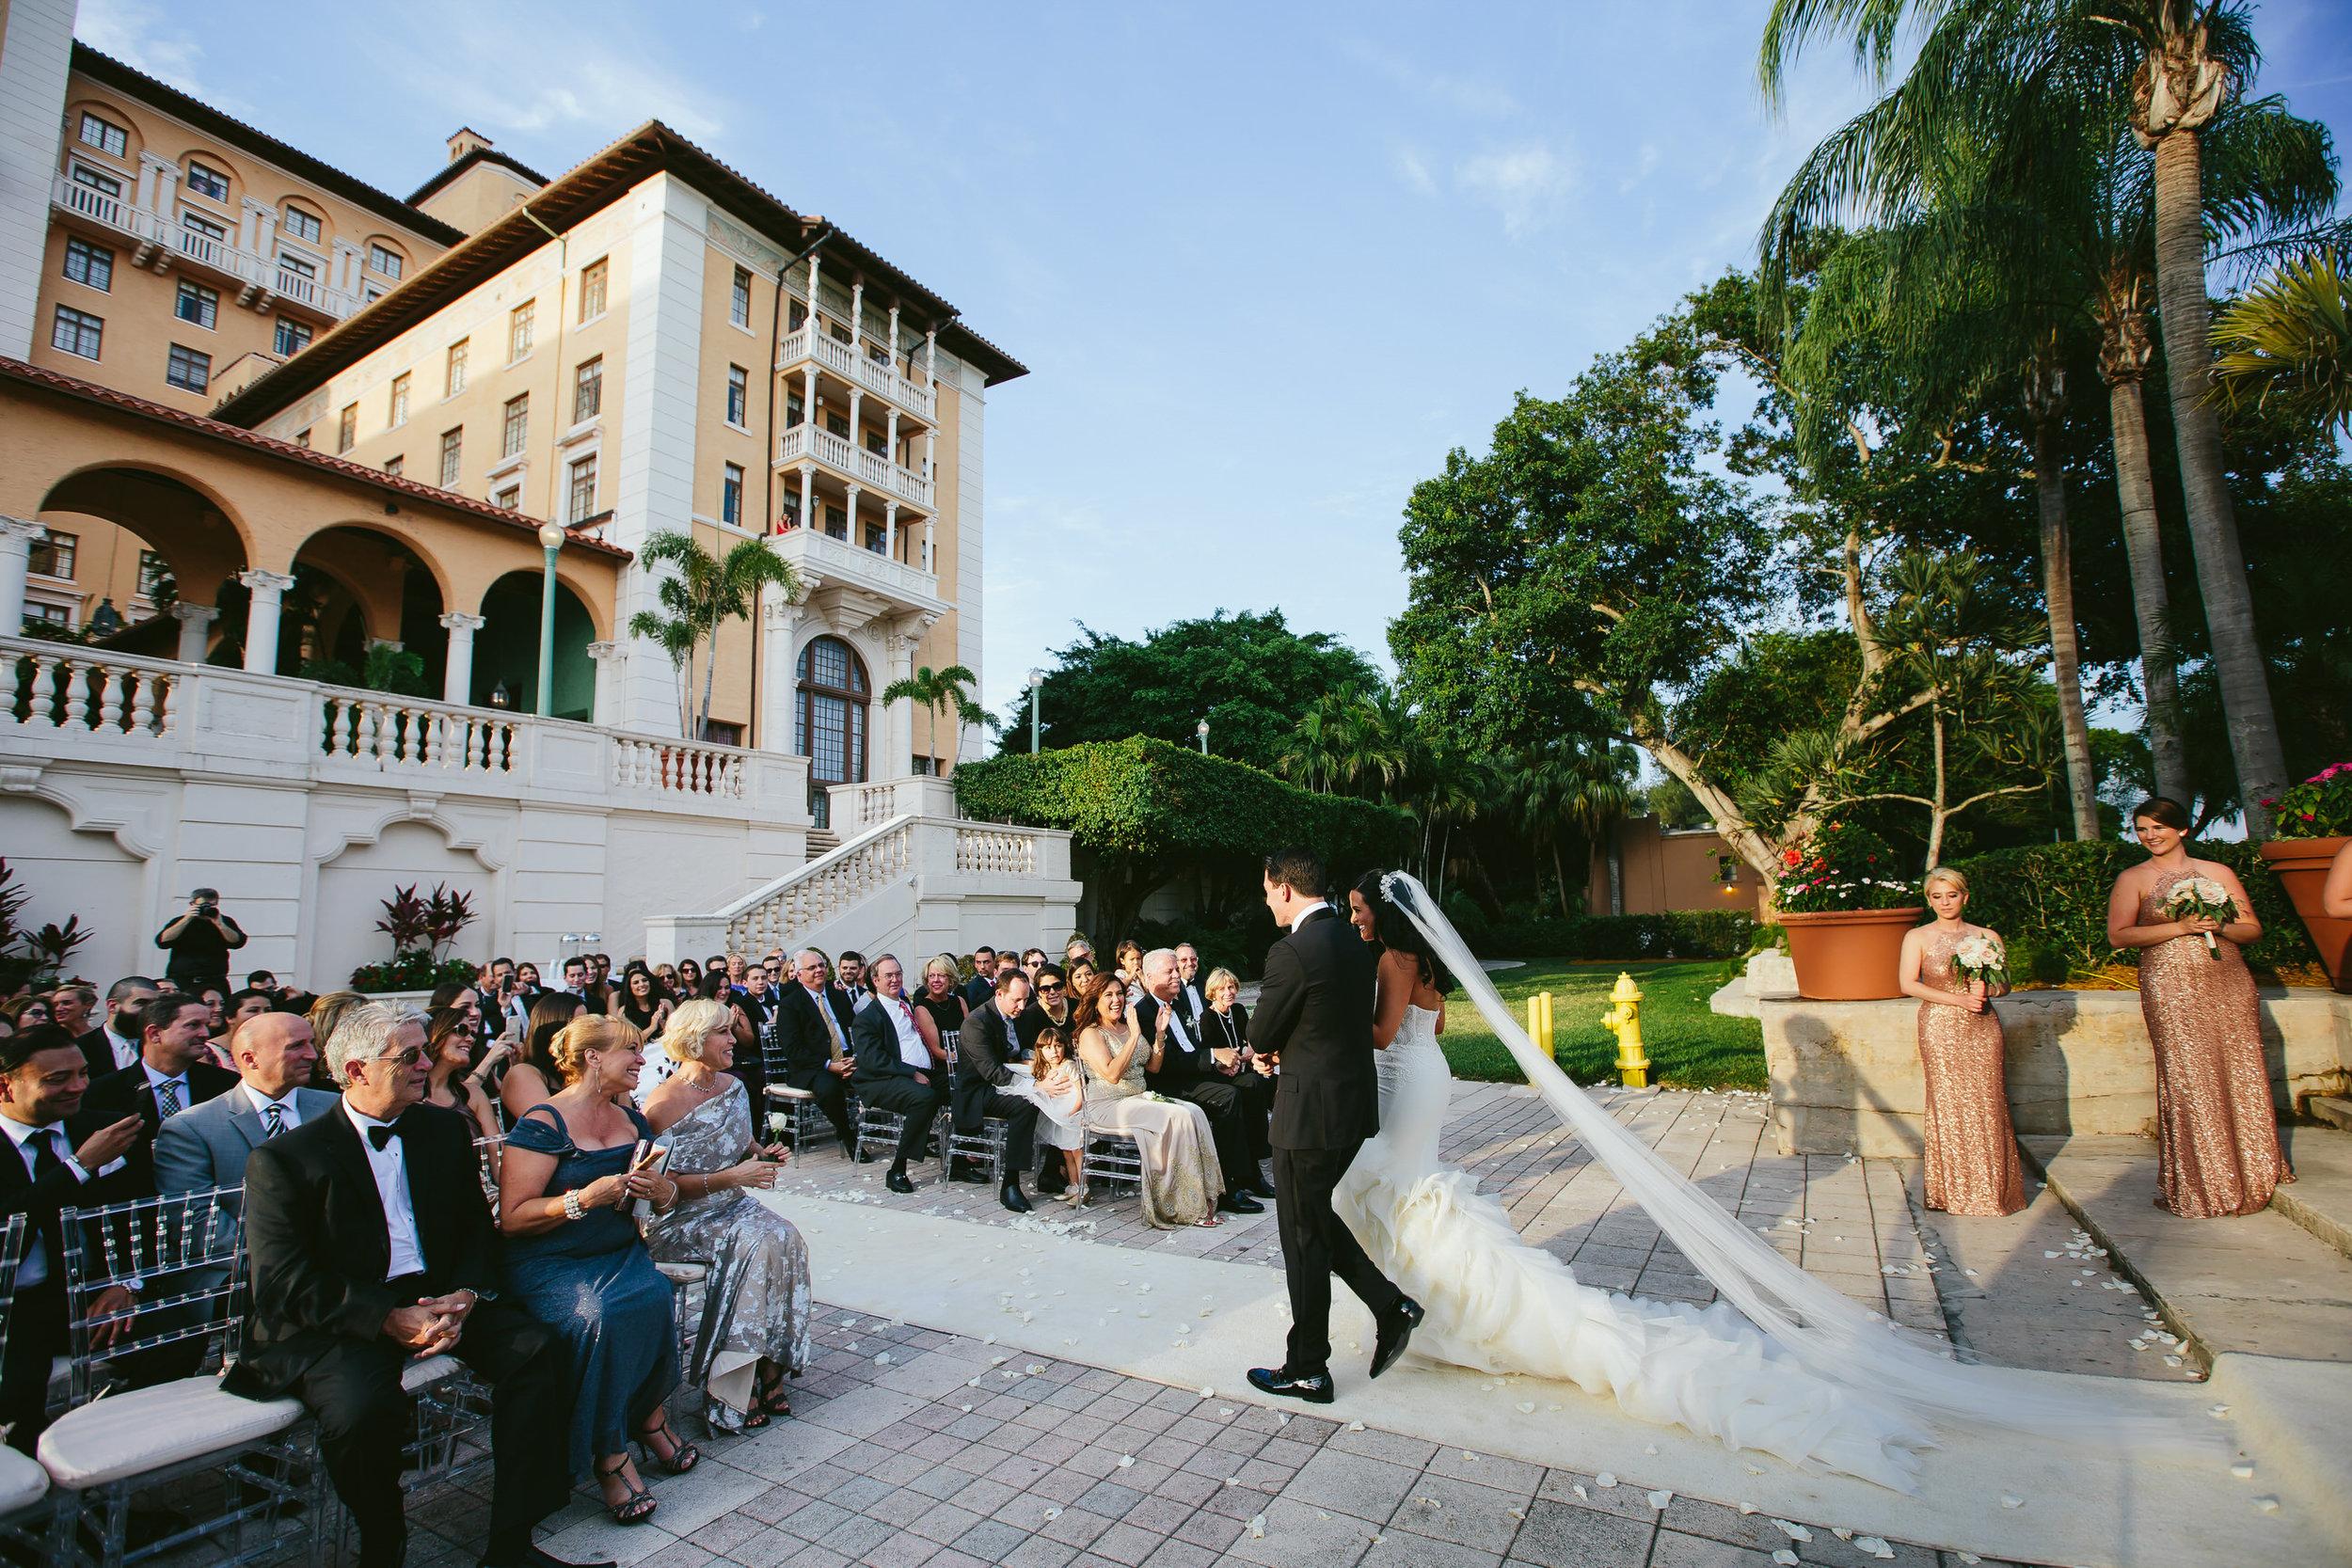 miami-biltmore-wedding-photographer-ceremony-steph-lynn-photo-33.jpg